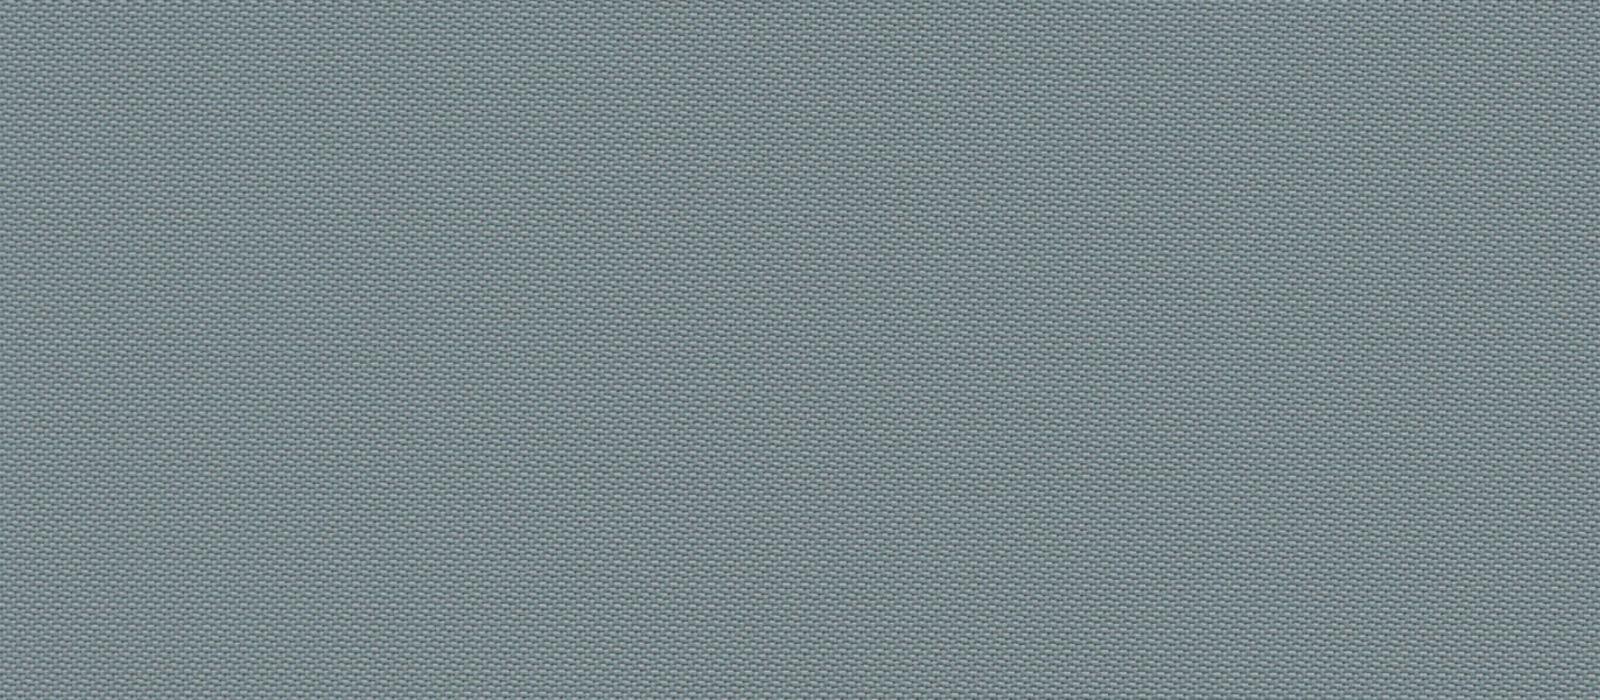 skai Galeno blue grey